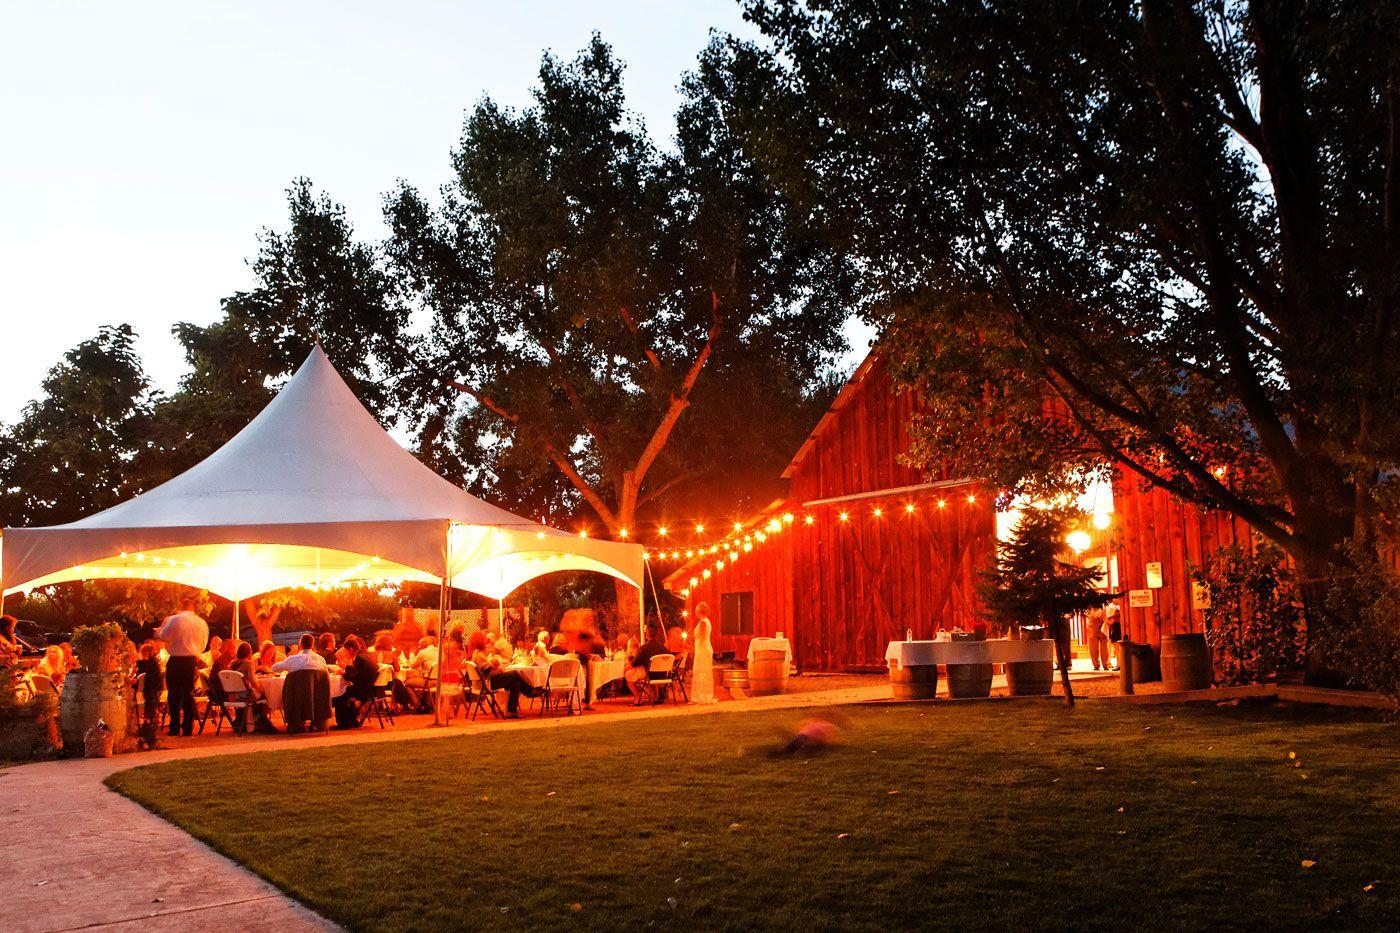 Http Www Bartonglasserweddings Com Palisade Winery Wedding Amy S Courtyard Winery Weddings Winery Courtyard Wedding